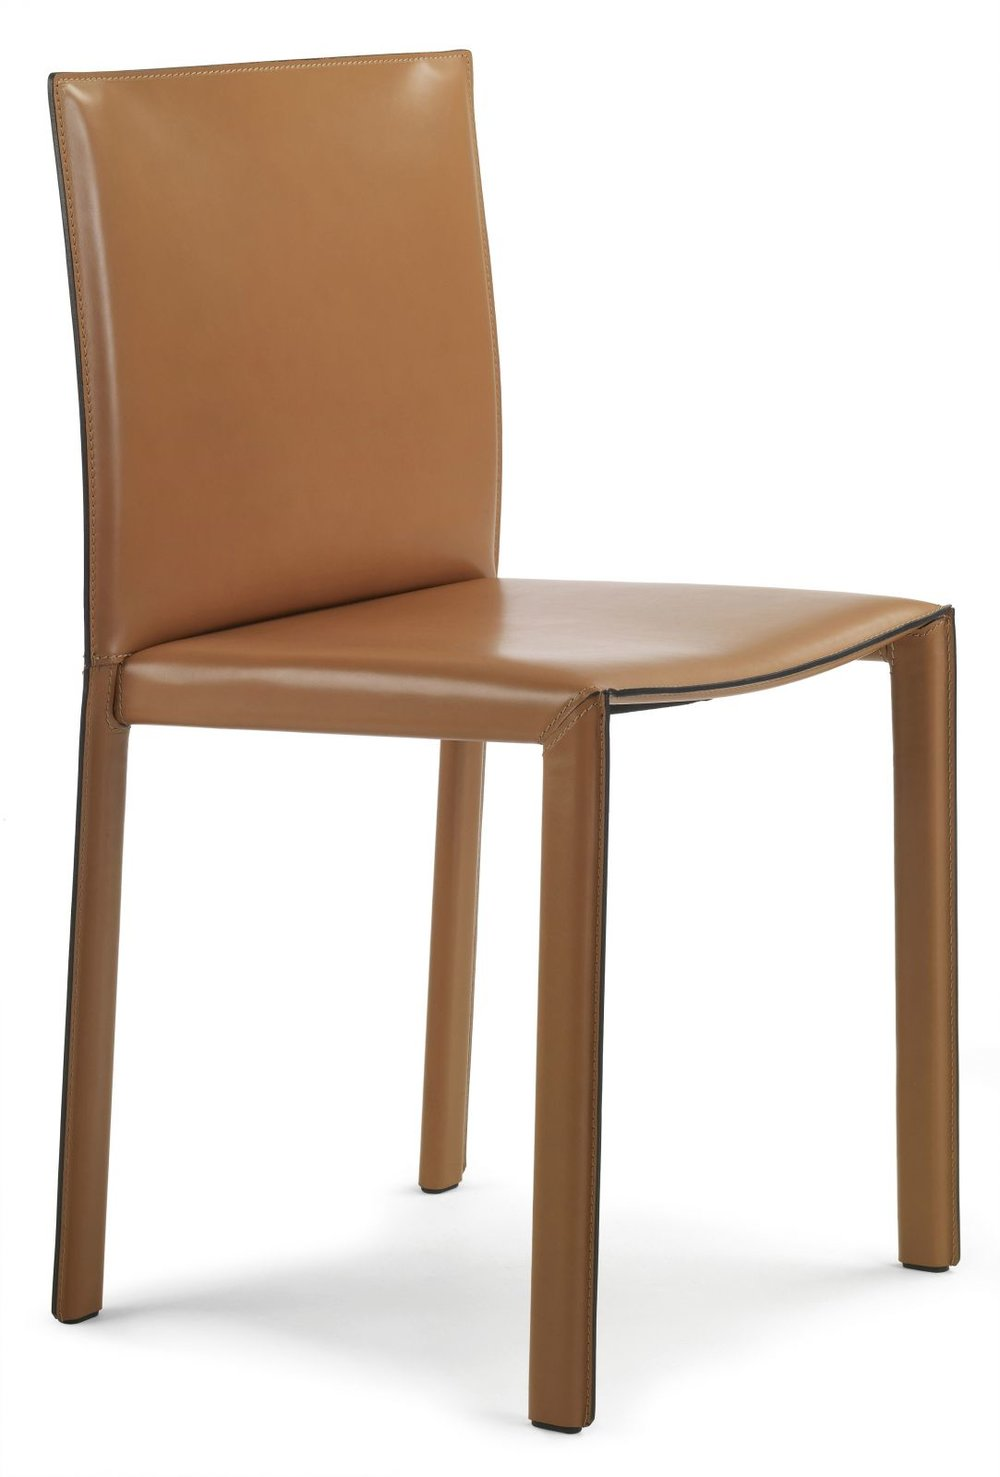 modern-office-furniture-chairs-Italian-designer-furniture (30).jpg